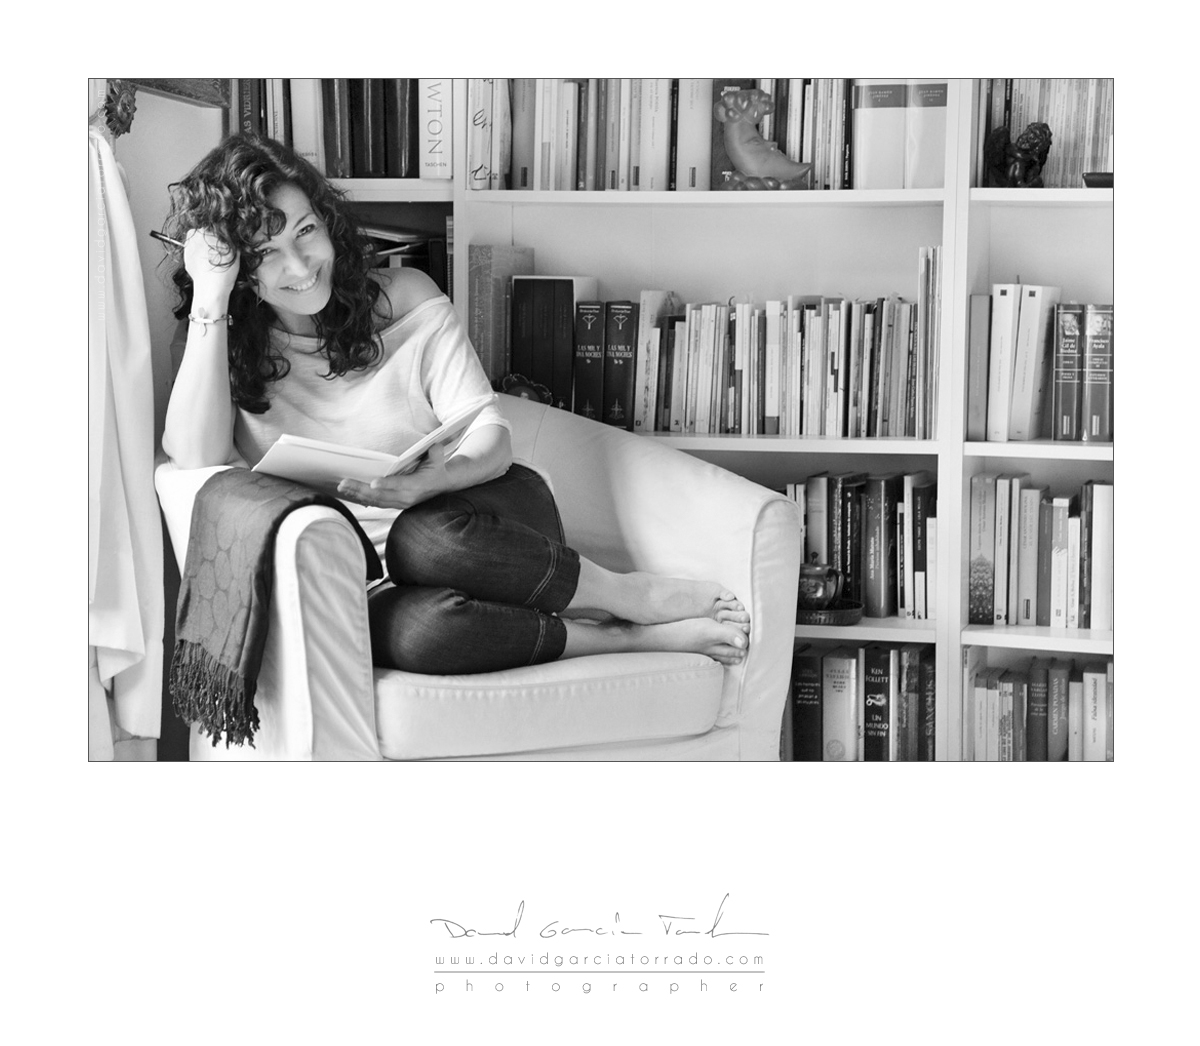 Cecilia Quílez 2012 Madrid | Poet | David García Torrado. International photographer, Asturias, Madrid, Munich.